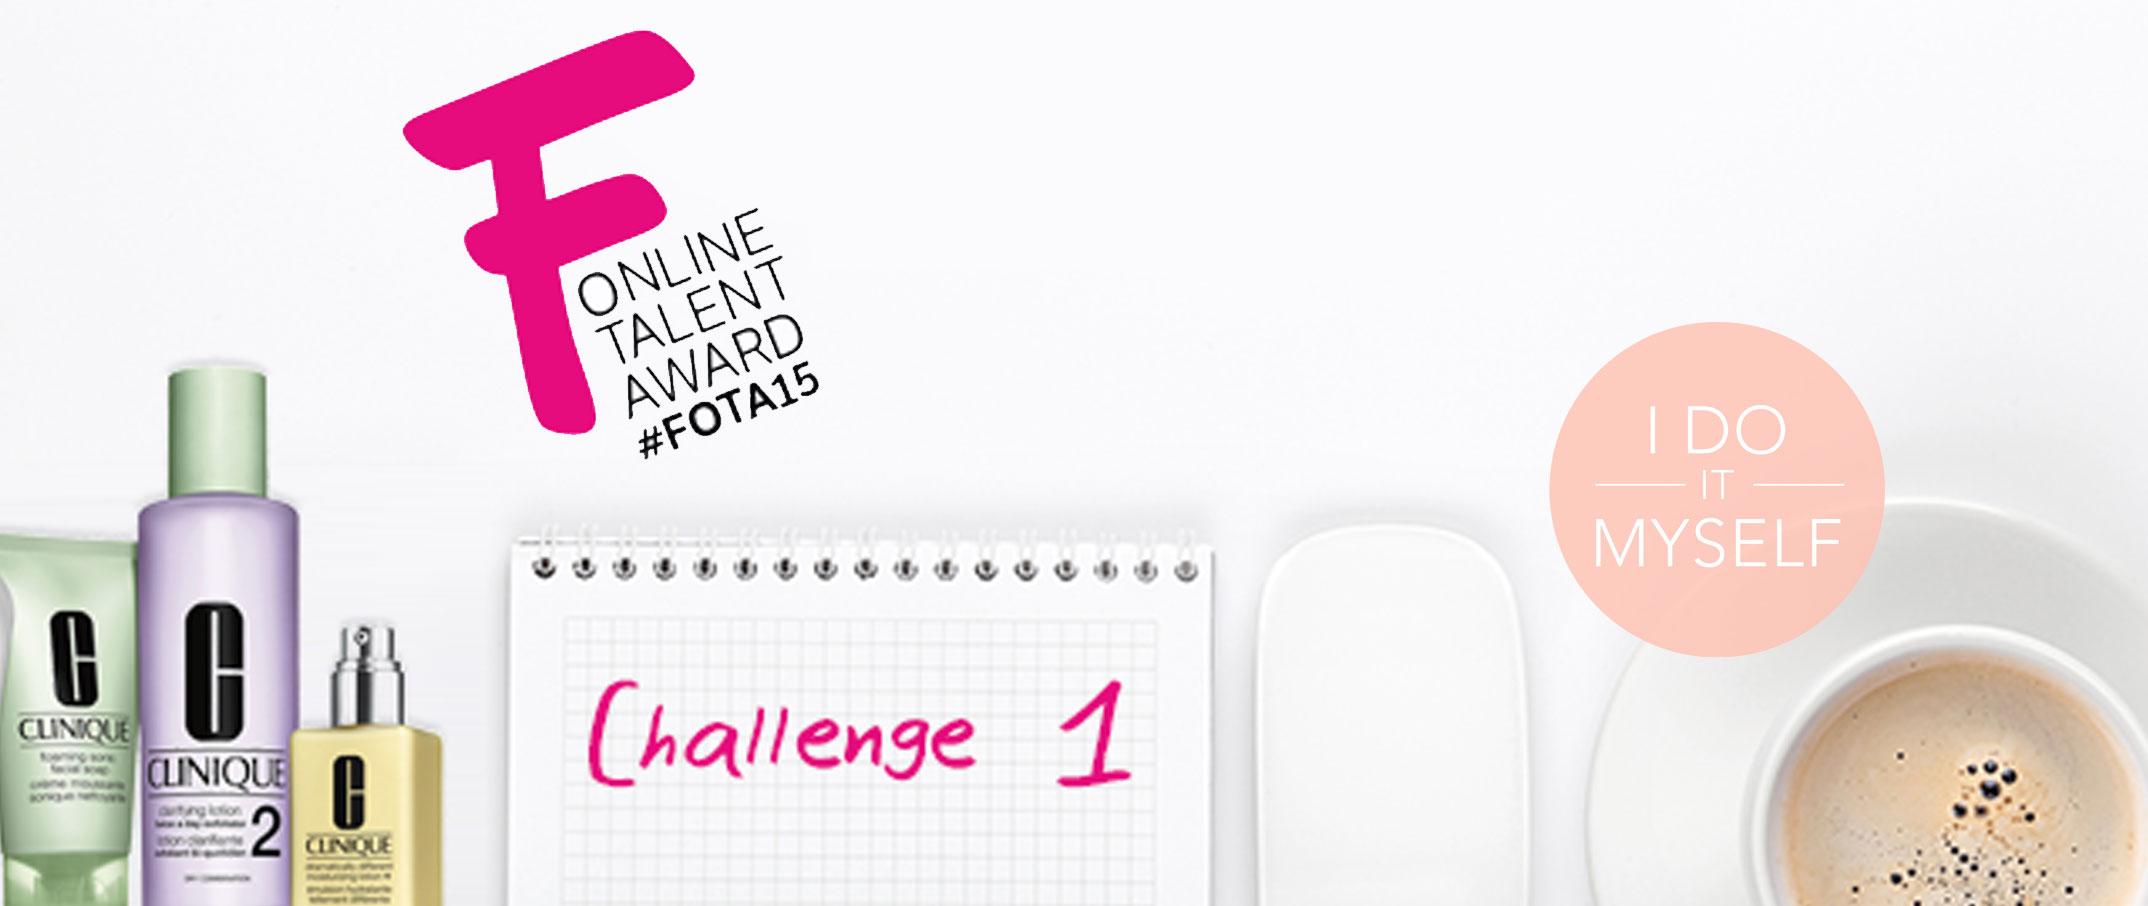 Flair Online Talent Award 2015 – Challenge 1